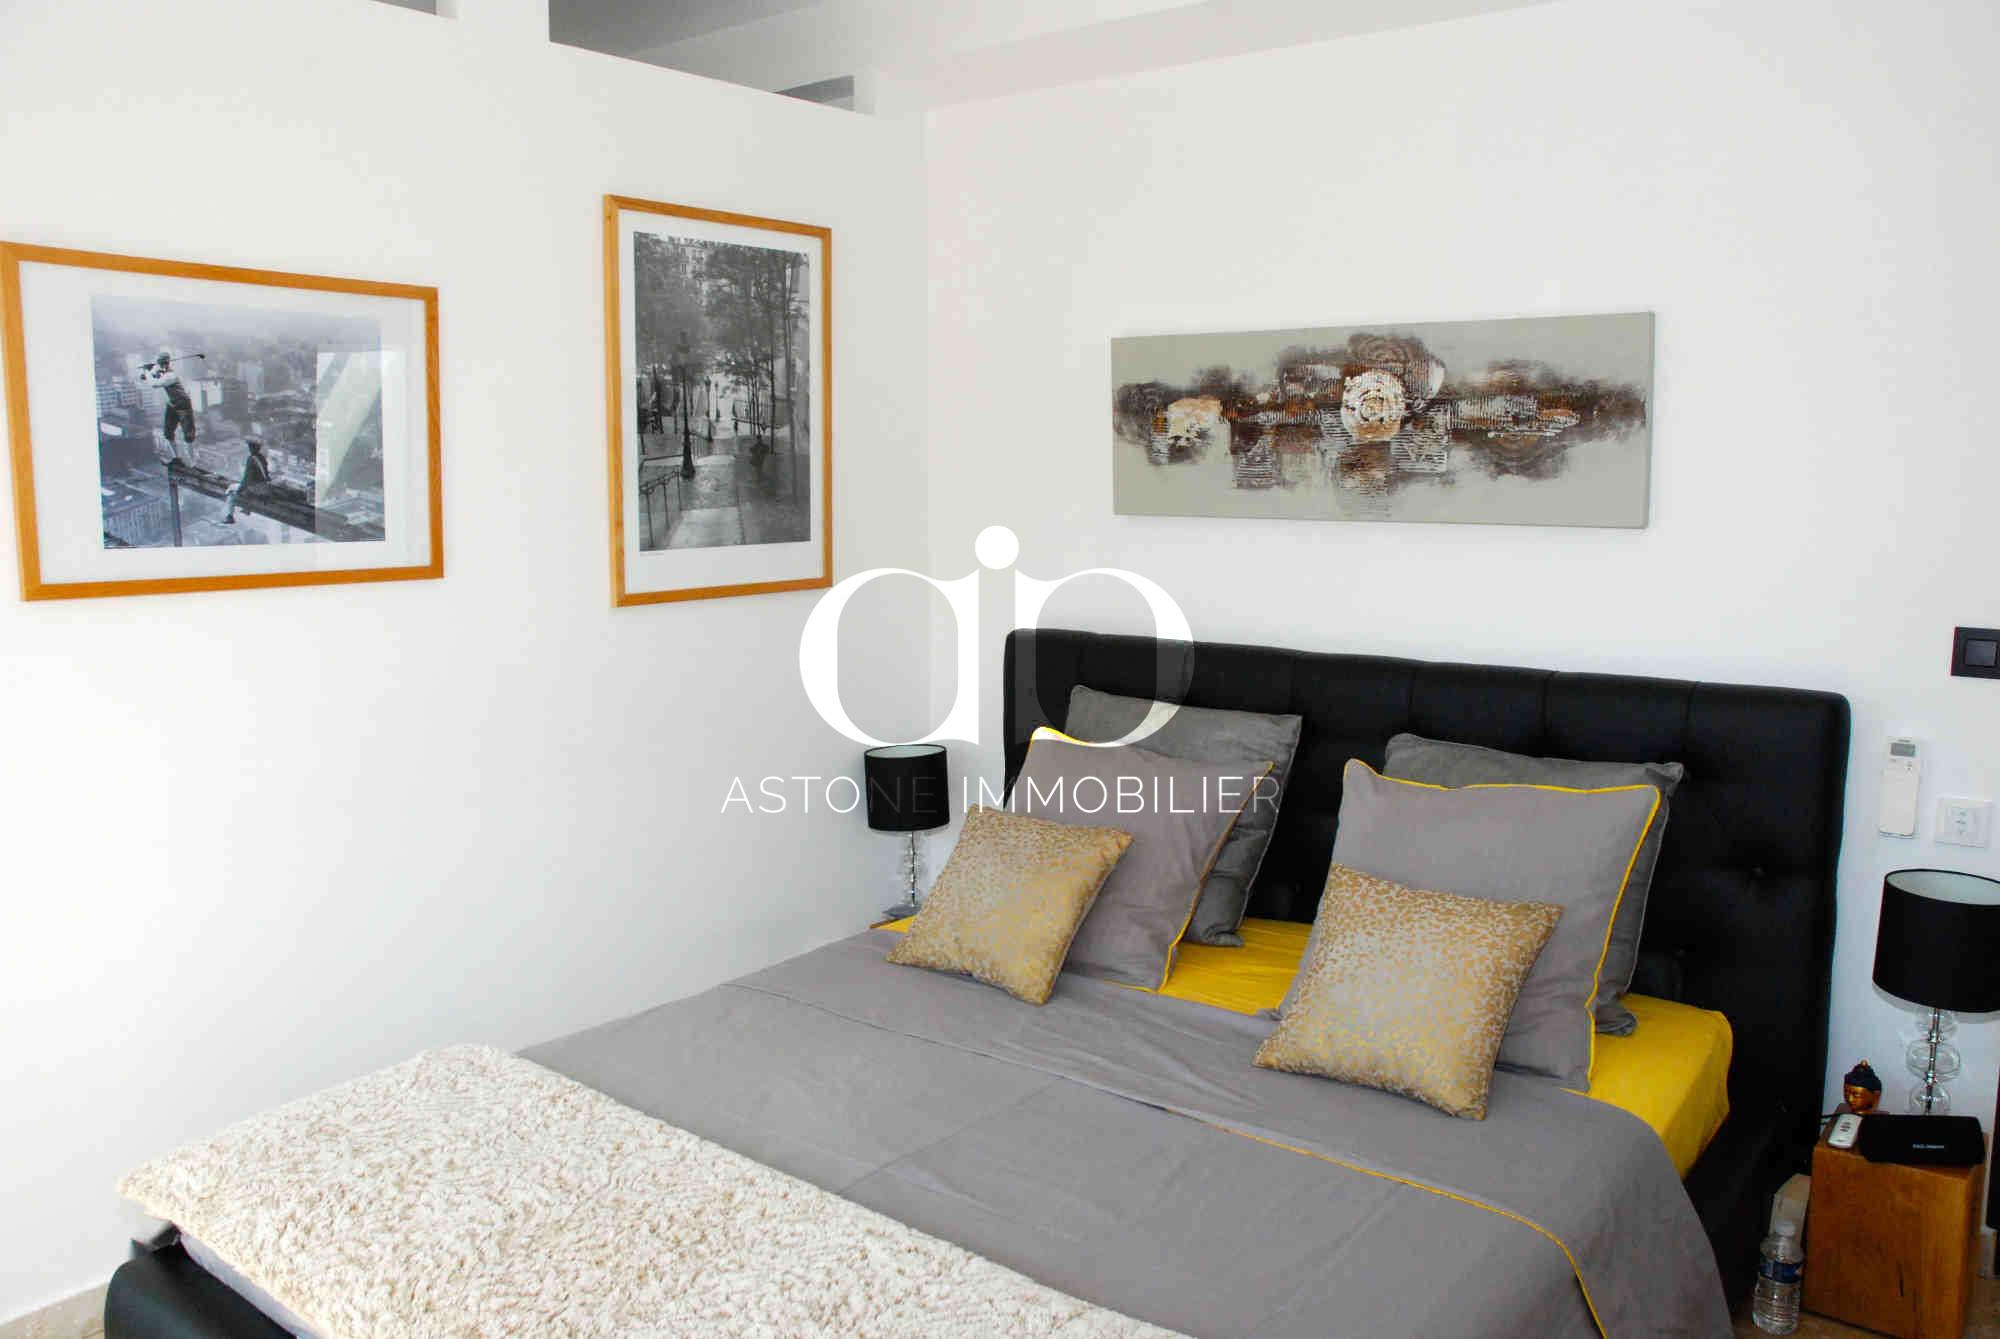 Aubagne lovely house for sale astone immobilier for Salon center aubagne